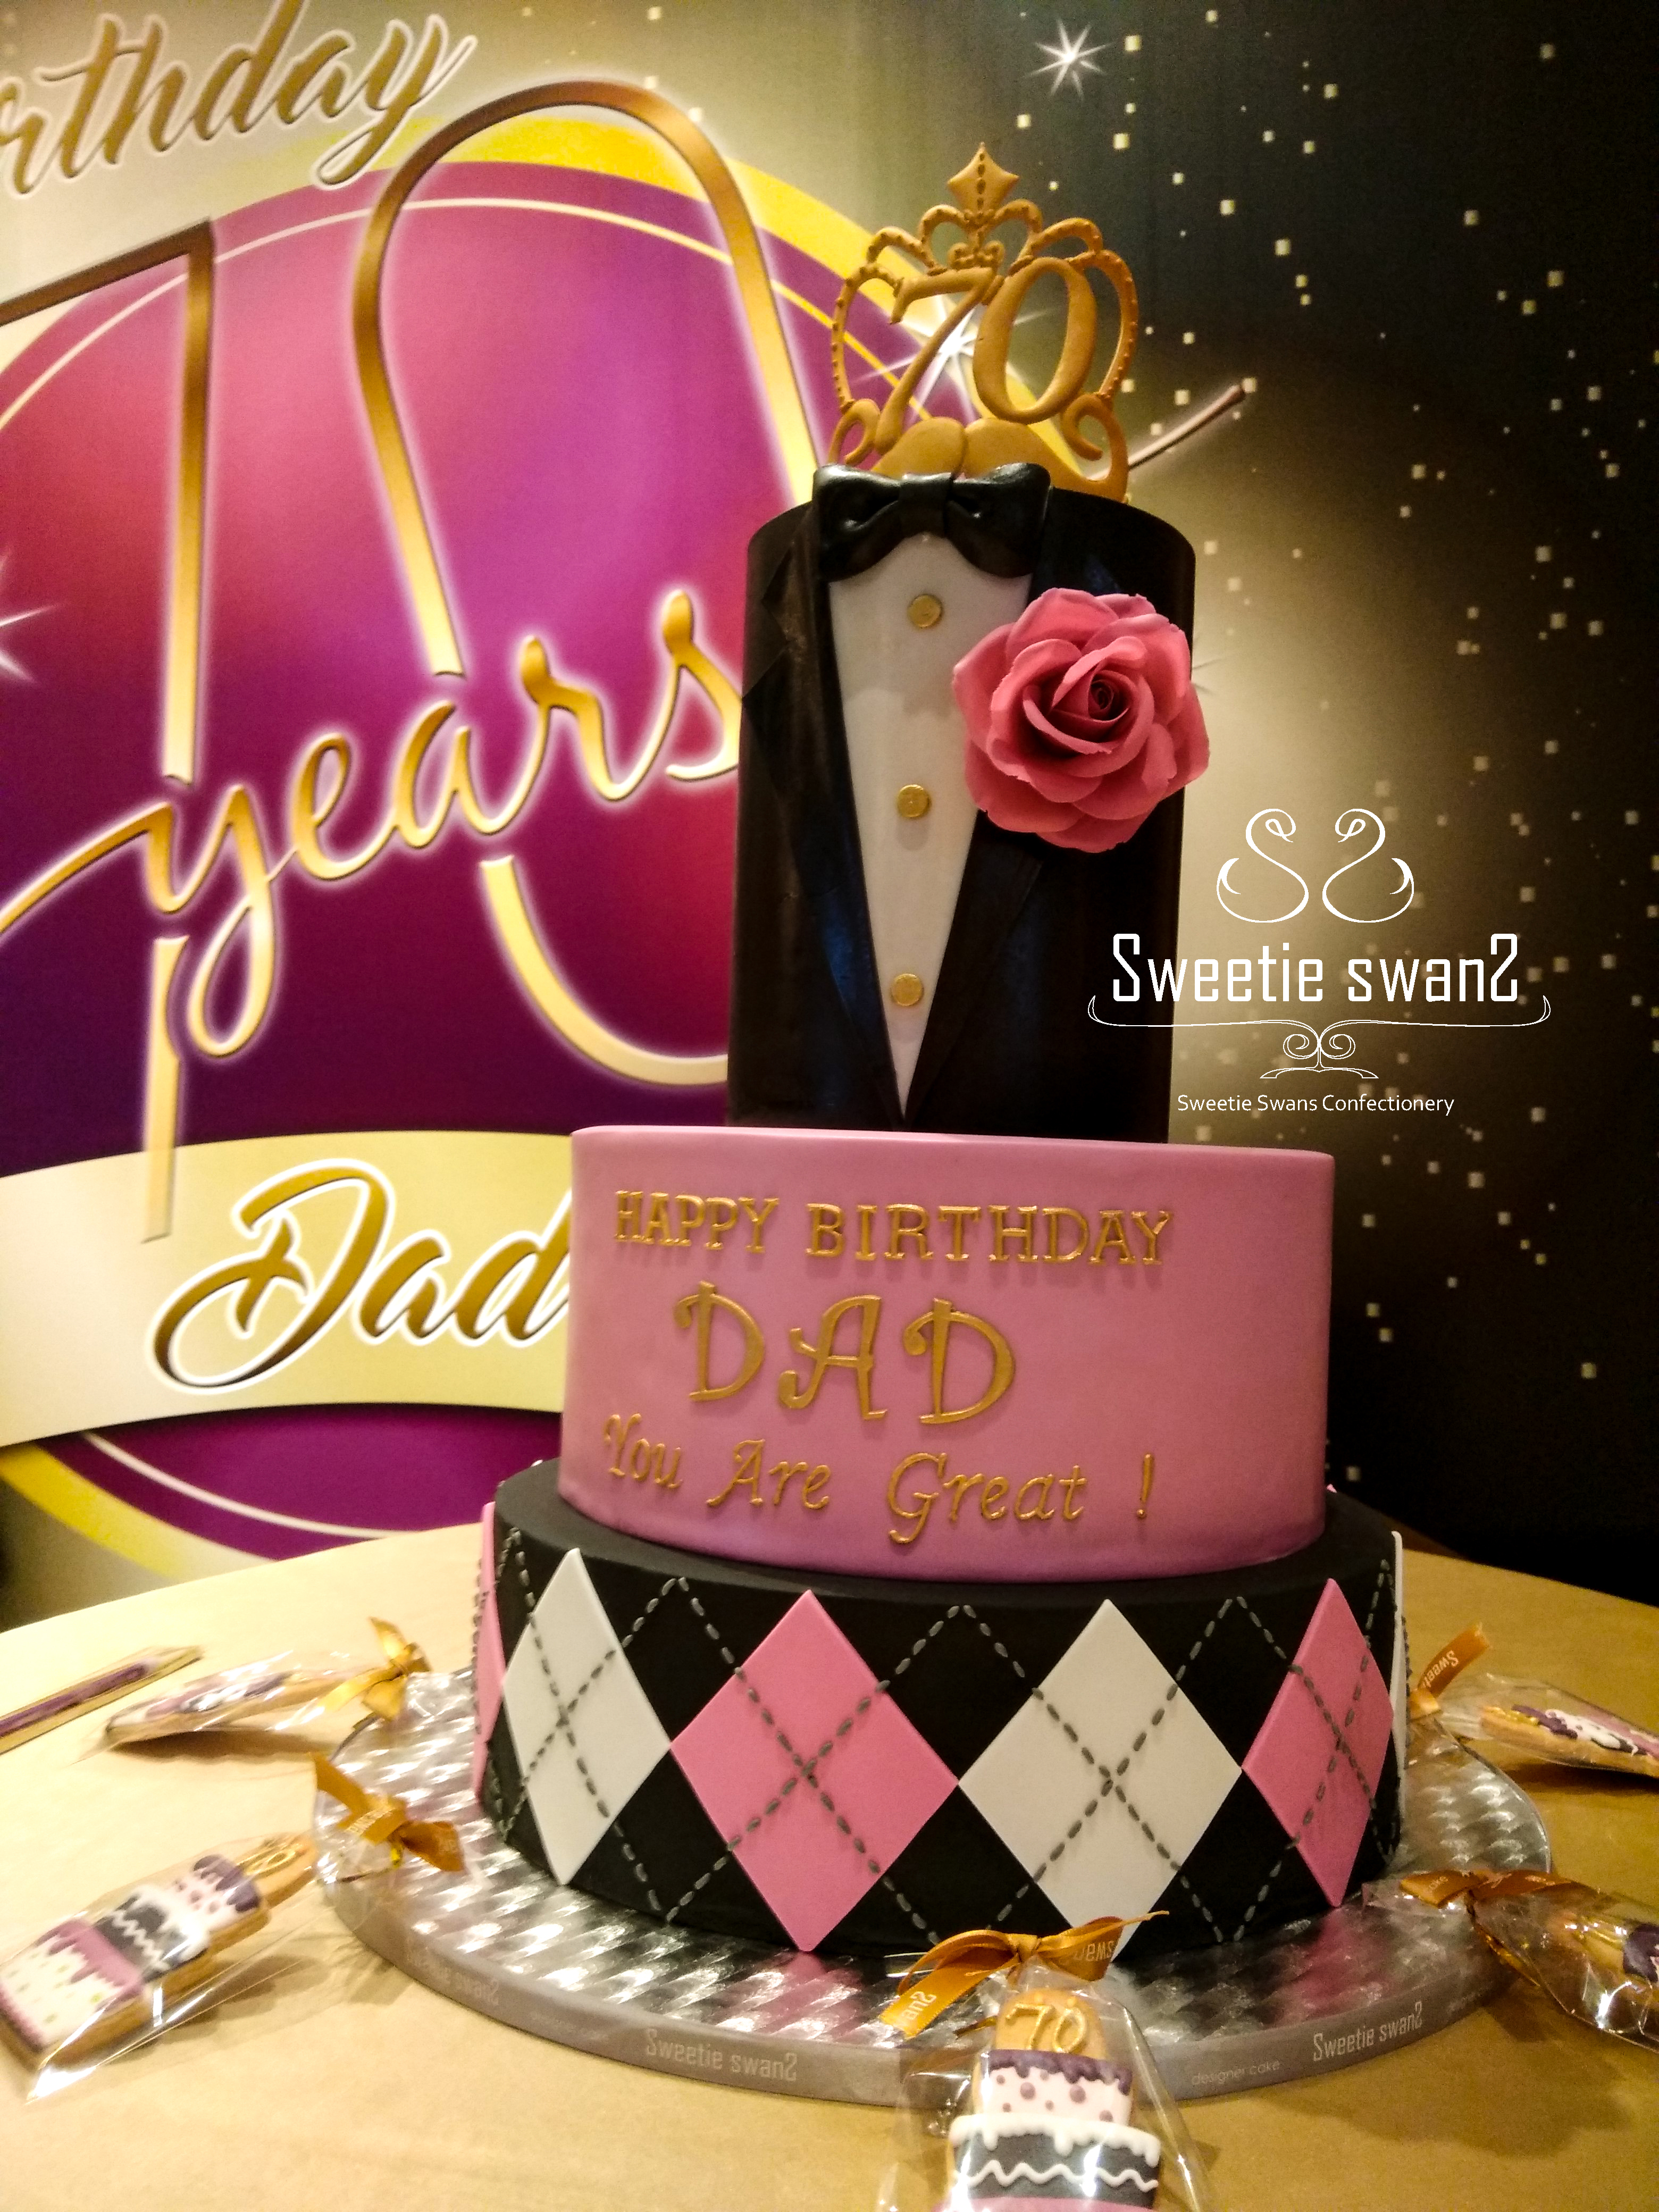 Tuxedo cake 70-1